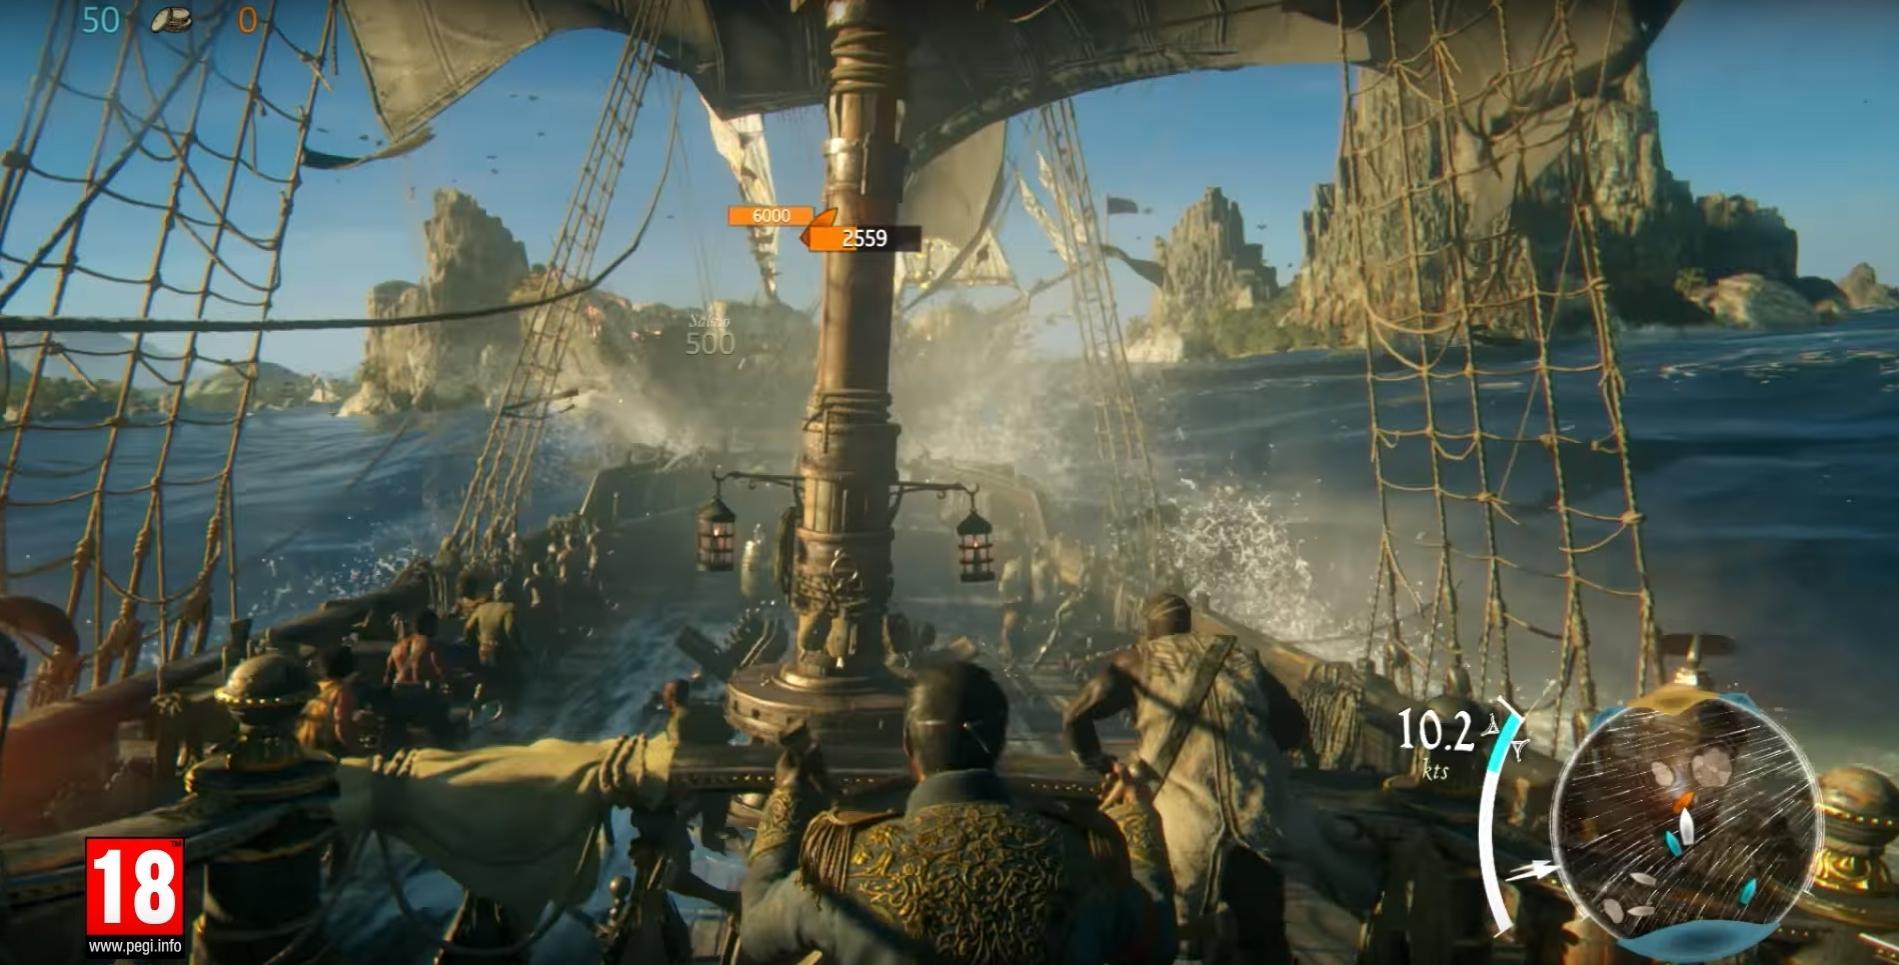 Skull And Bones Video Game 2018 Ubisoft: Skull & Bones Gameplay Trailer Debuts